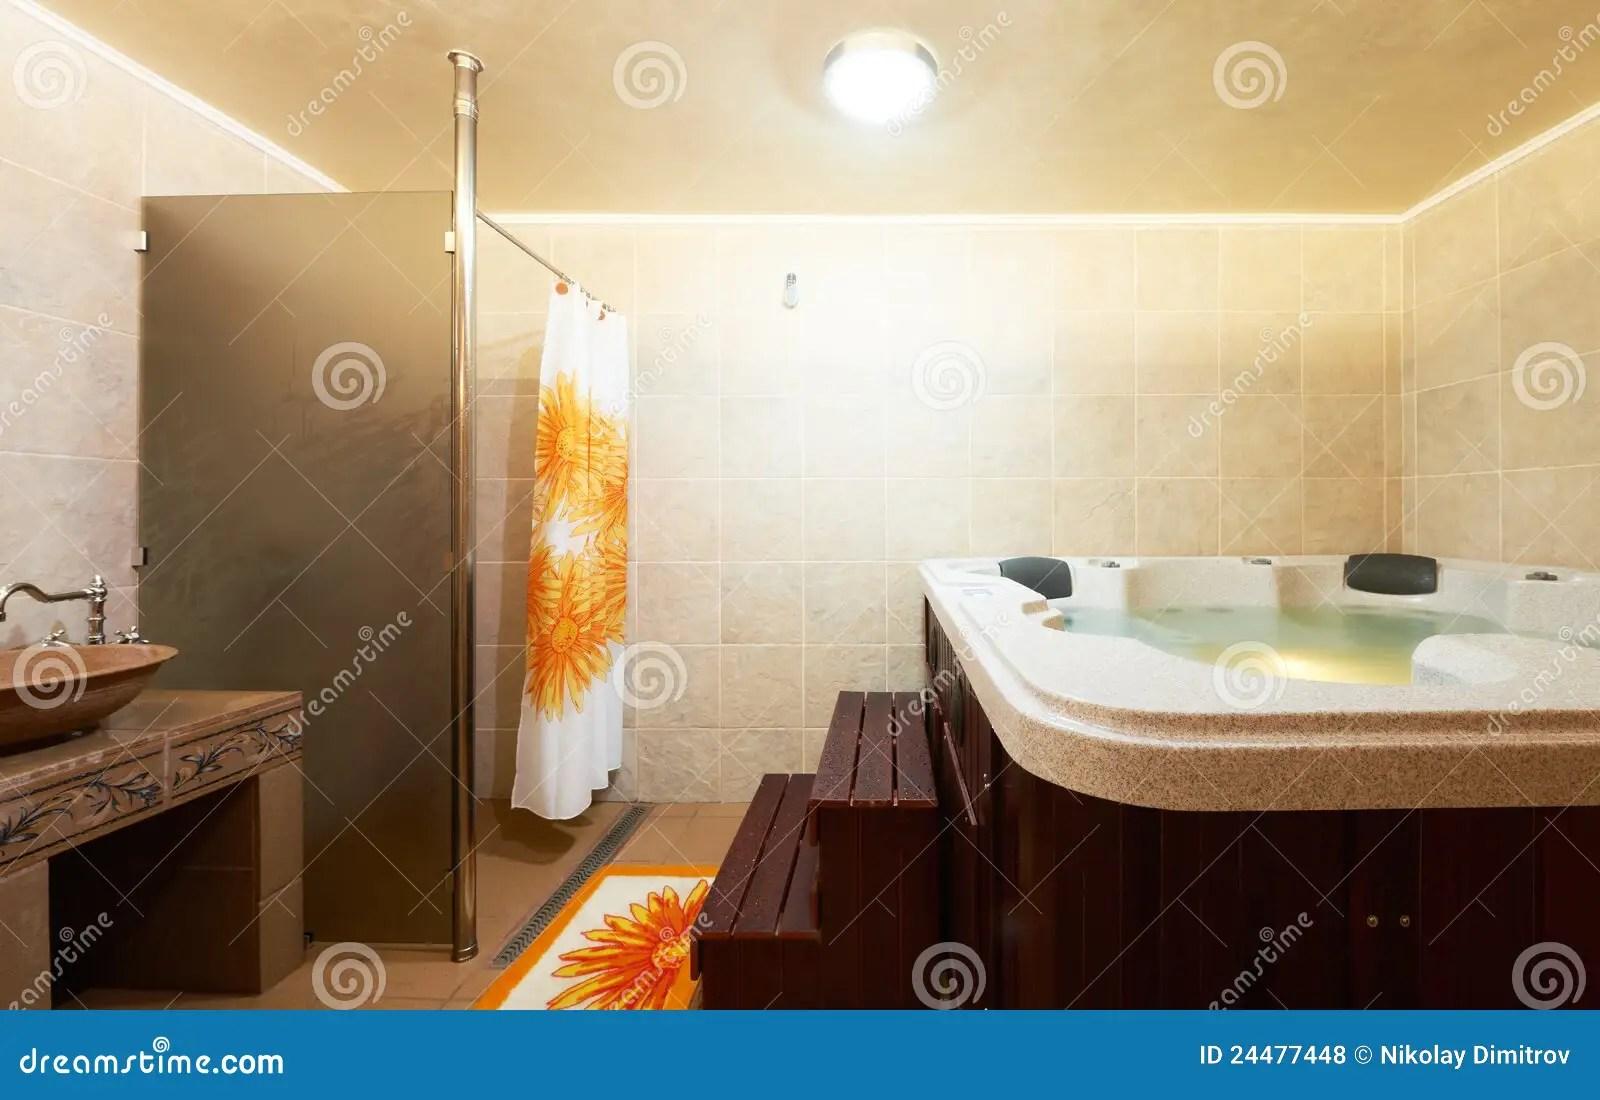 Modern Bathroom With Jacuzzi Stock Photo  Image 24477448